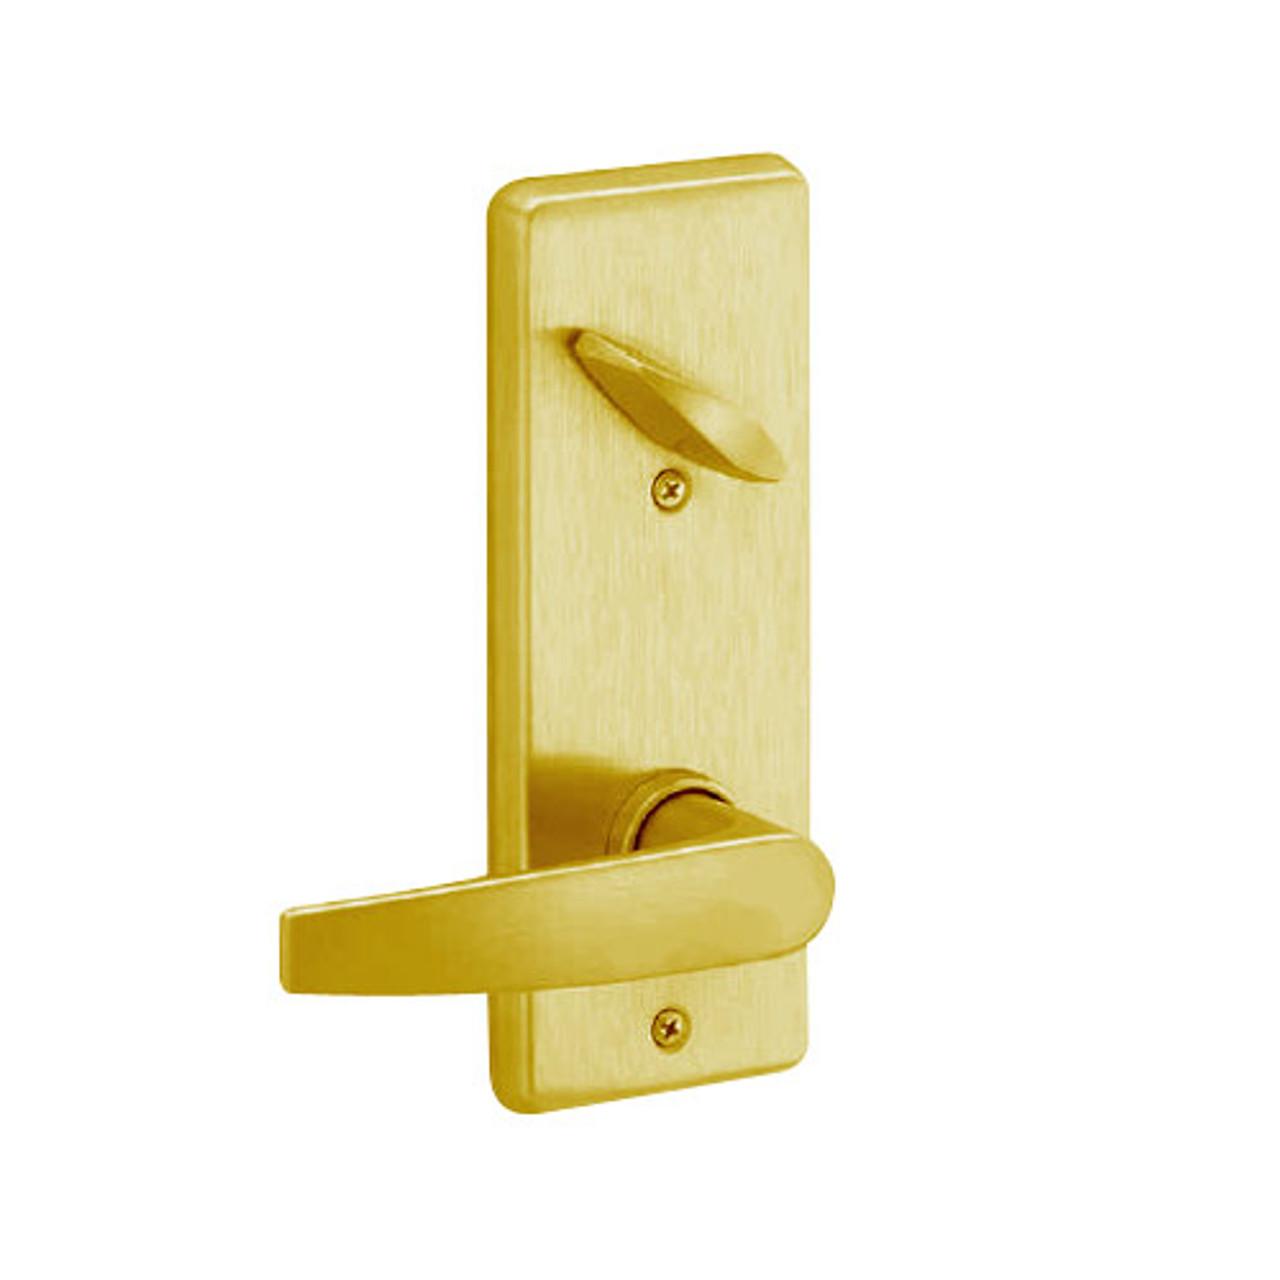 S290-JUP-605 Schlage S290 Jupiter Style Interconnected Lock in Bright Brass